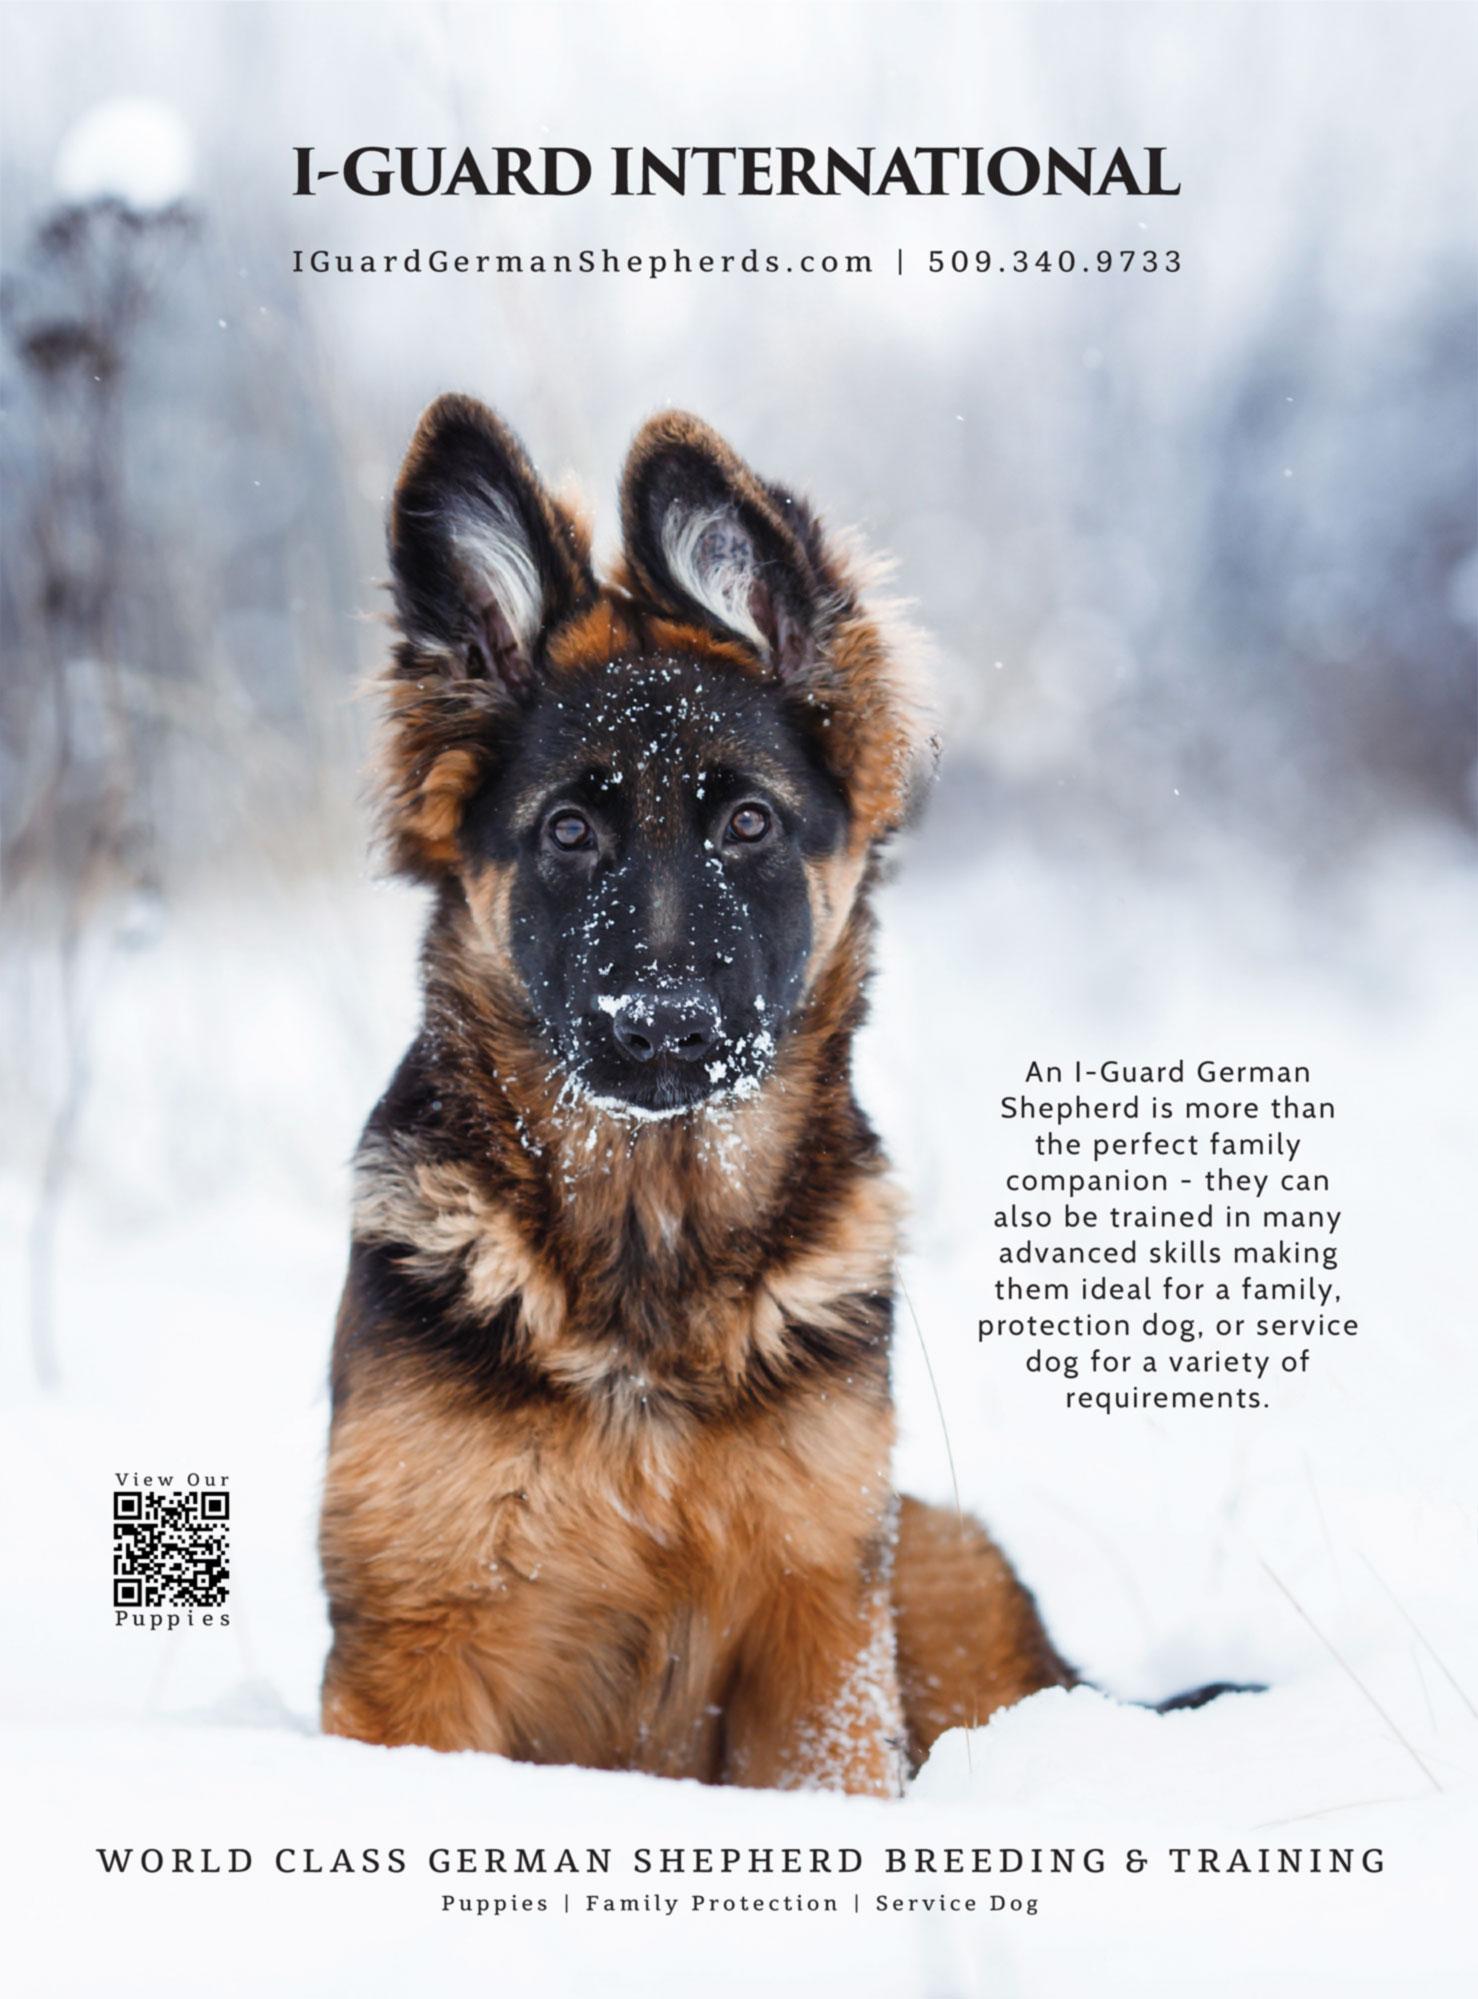 I-Guard International, marketing materials